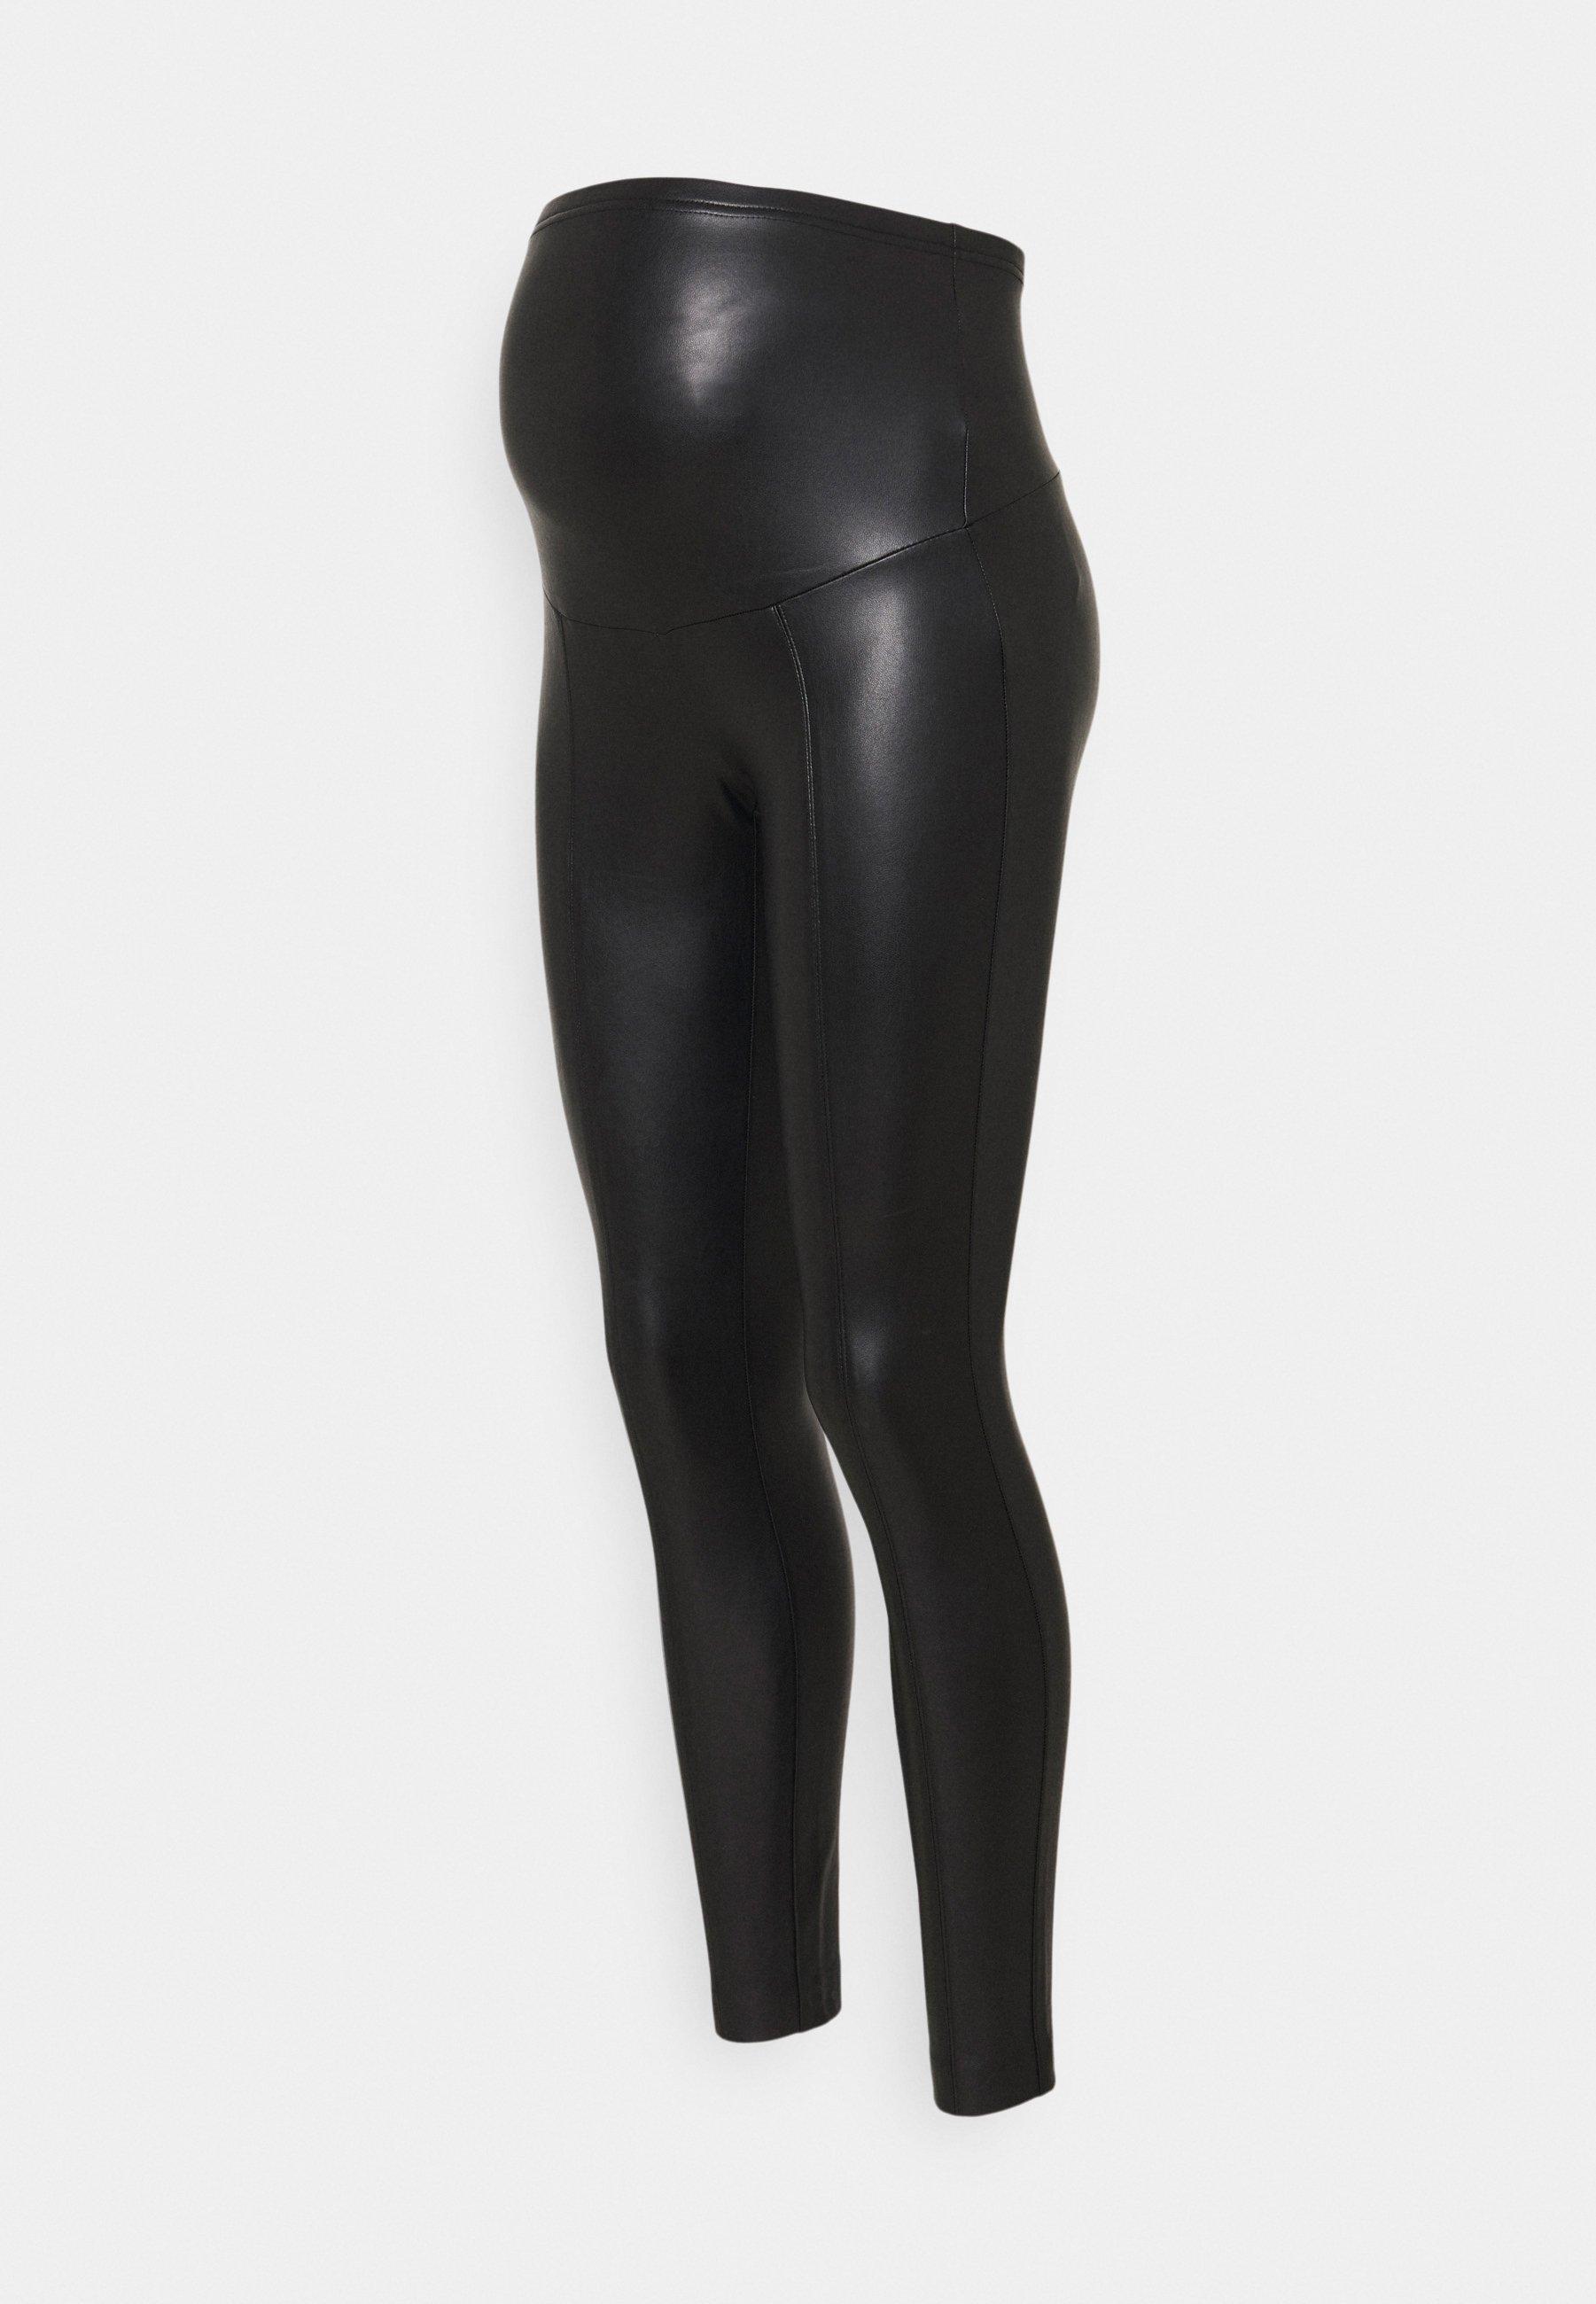 Damen OLMHANNA - Leggings - Hosen